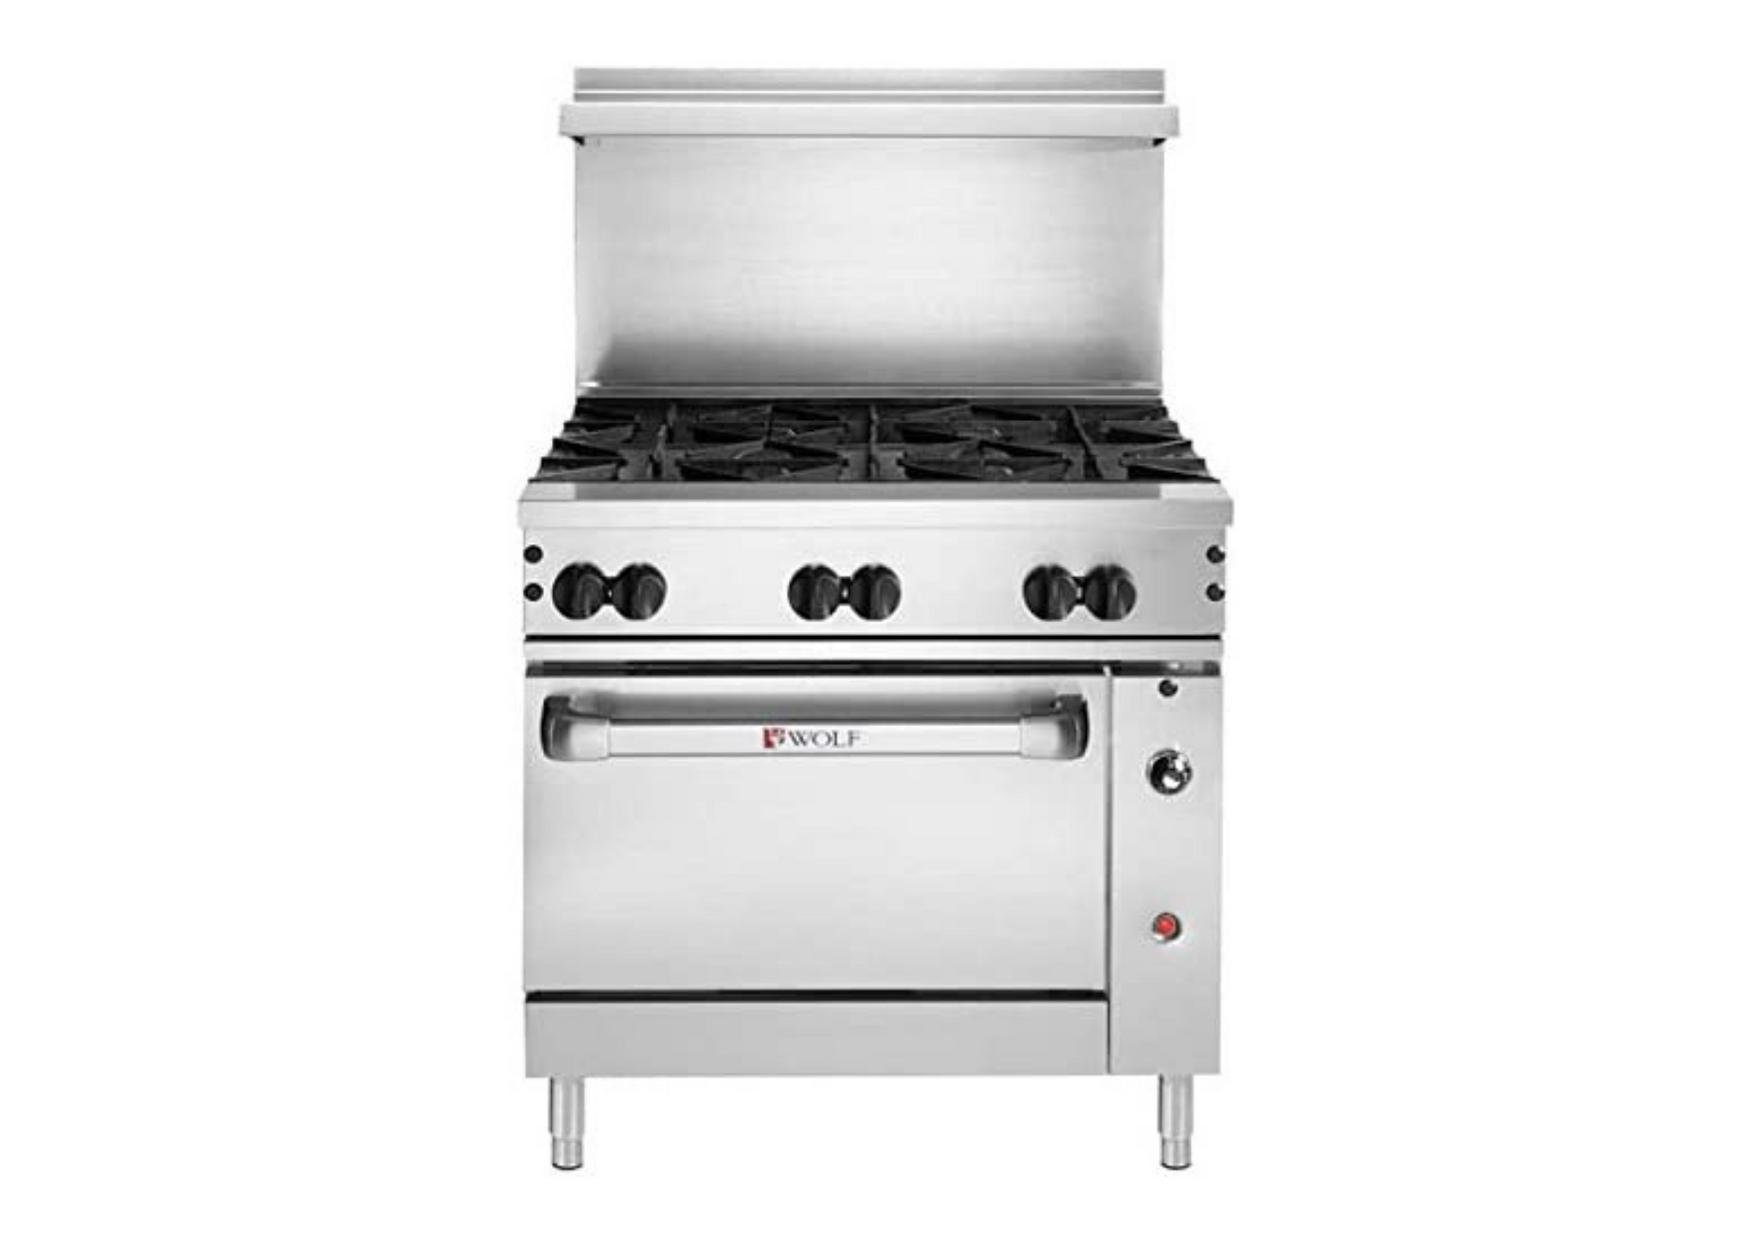 a Wolf range stove